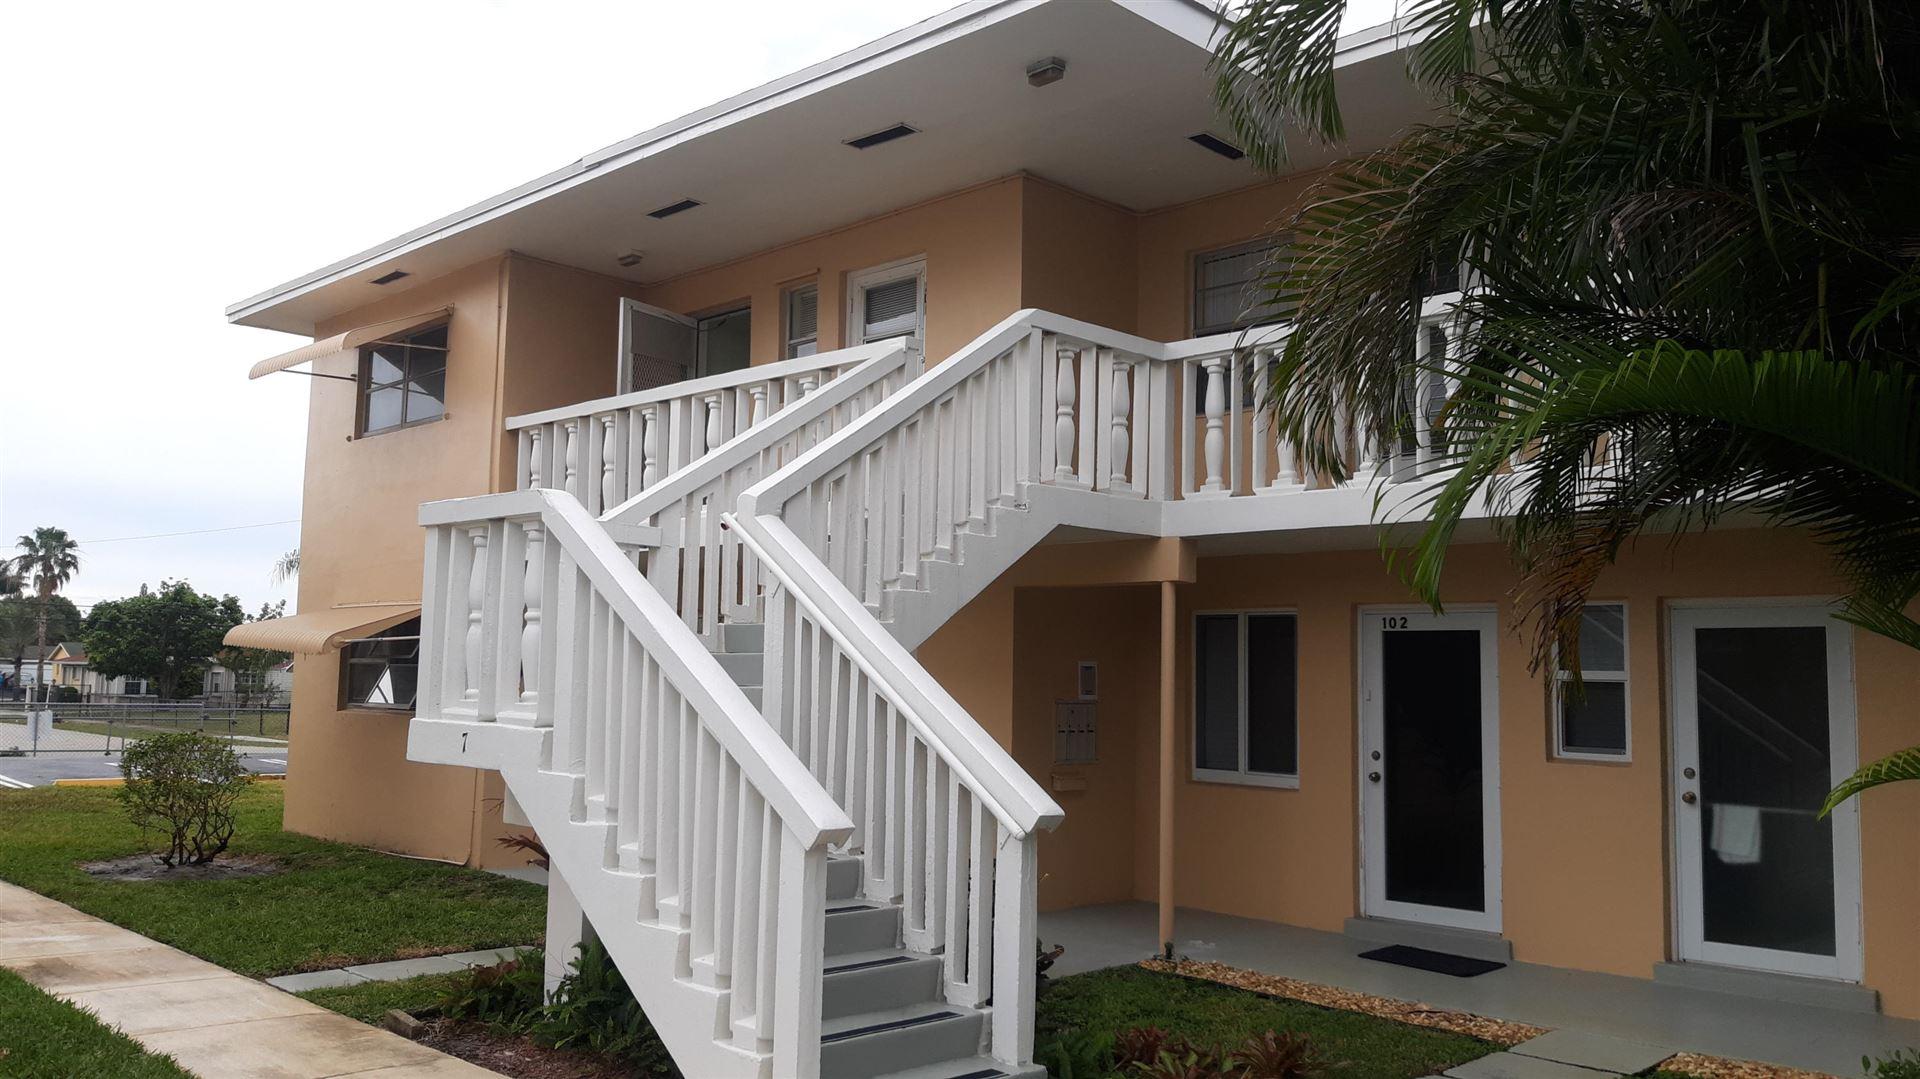 2111 NE 1st Court #7-201, Boynton Beach, FL 33435 - MLS#: RX-10685448